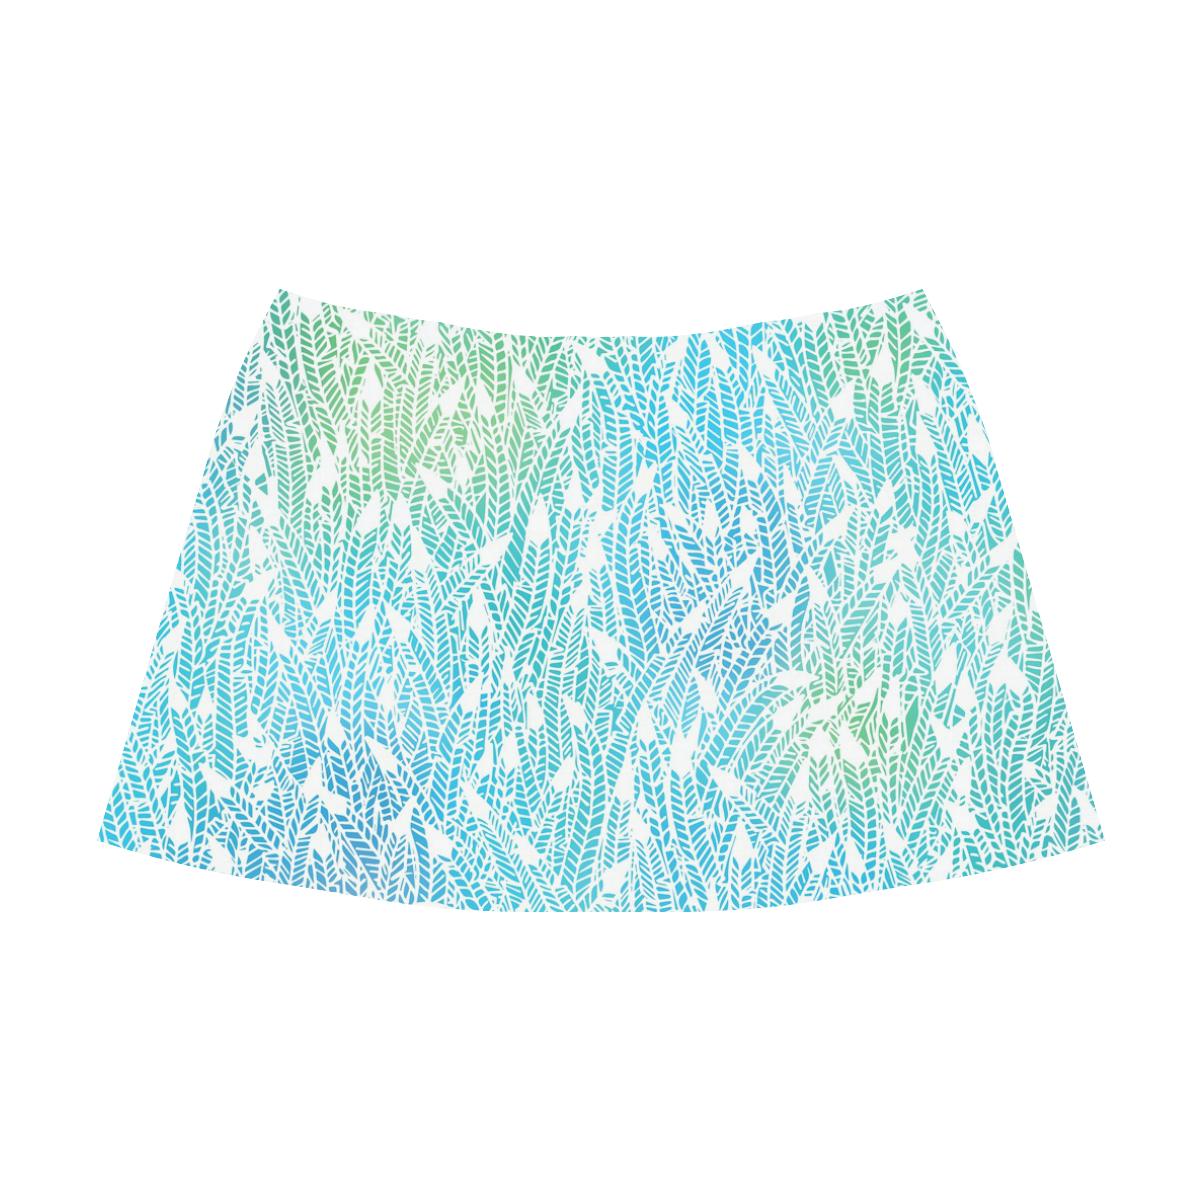 blue white feather pattern Mnemosyne Women's Crepe Skirt (Model D16)